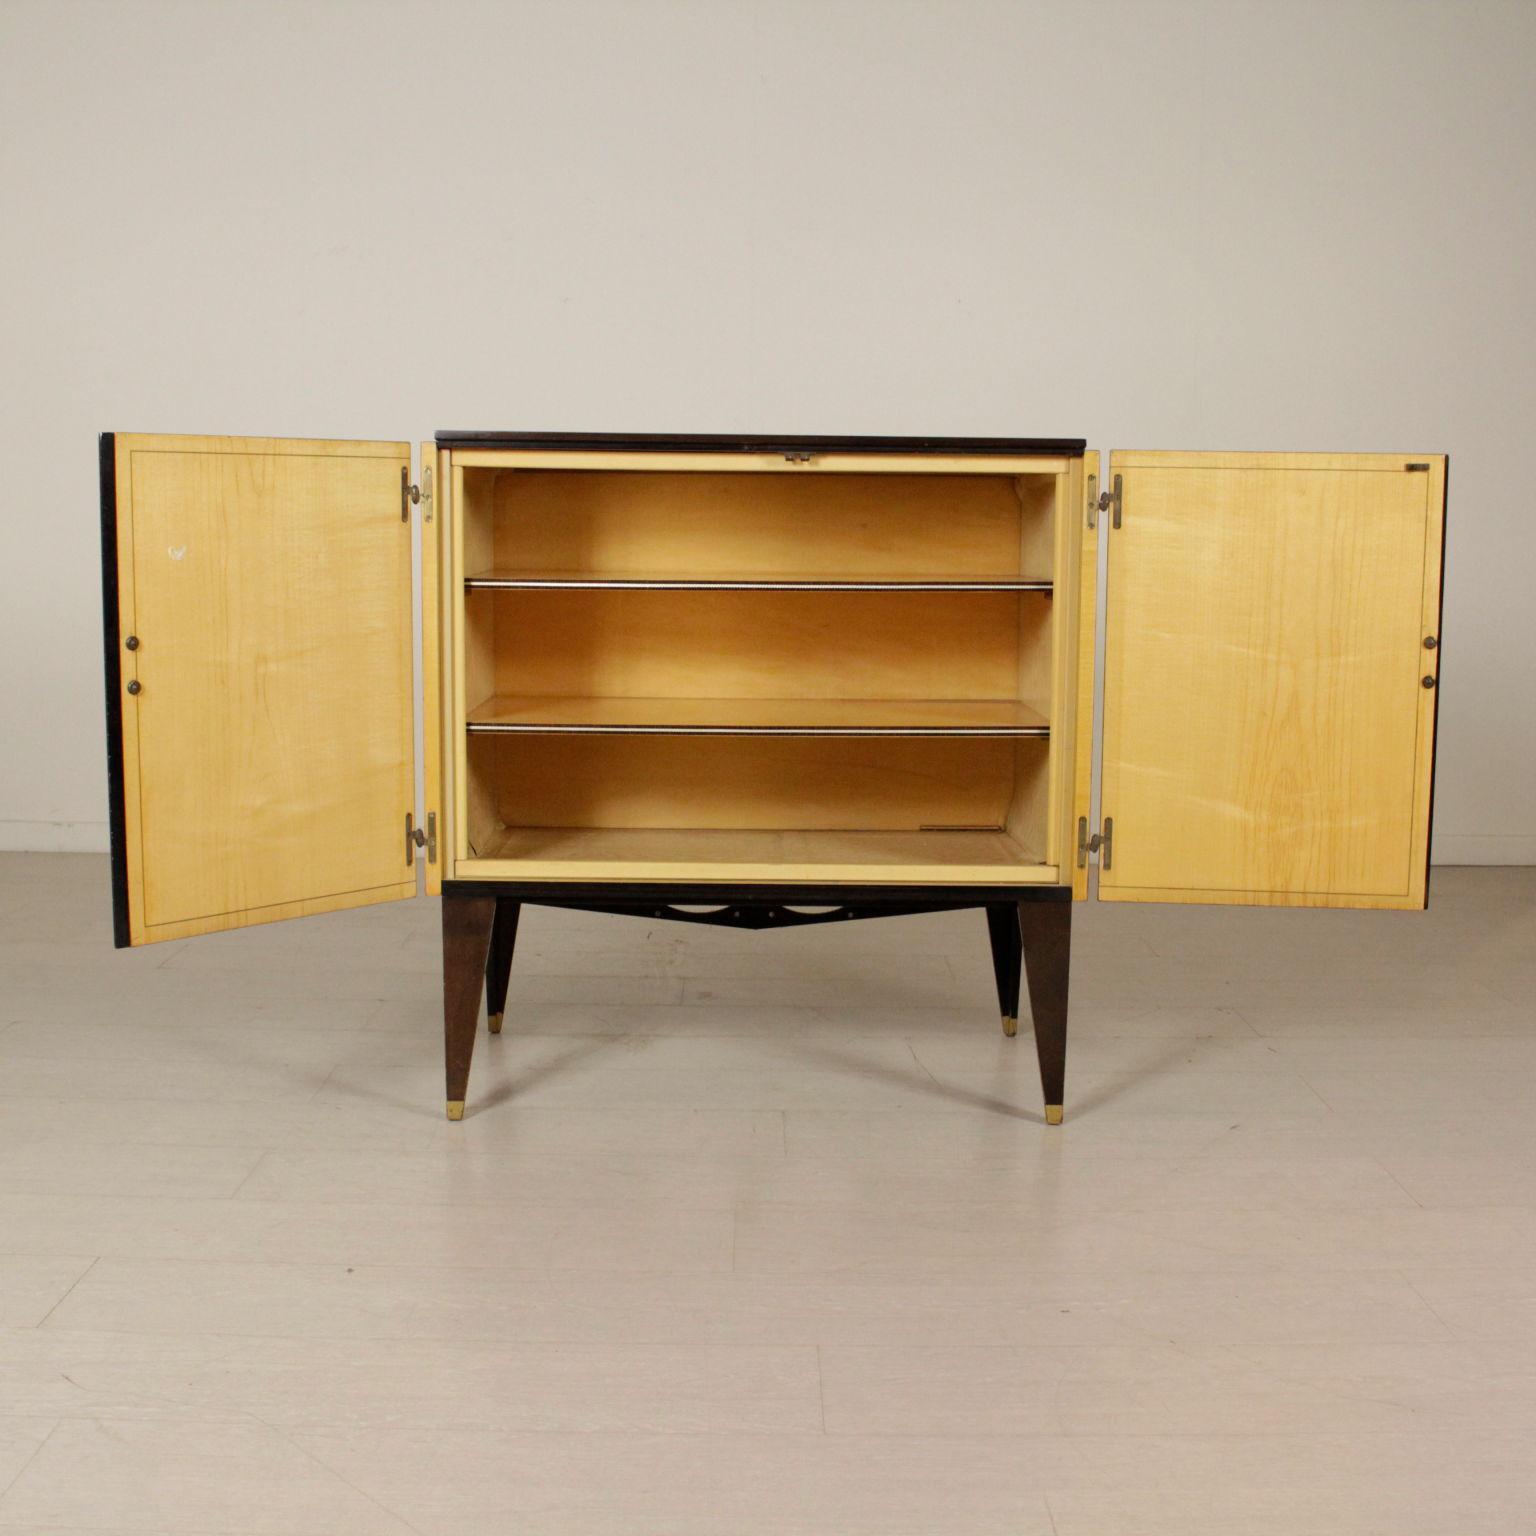 m vil de 50 a os muebles dise o moderno